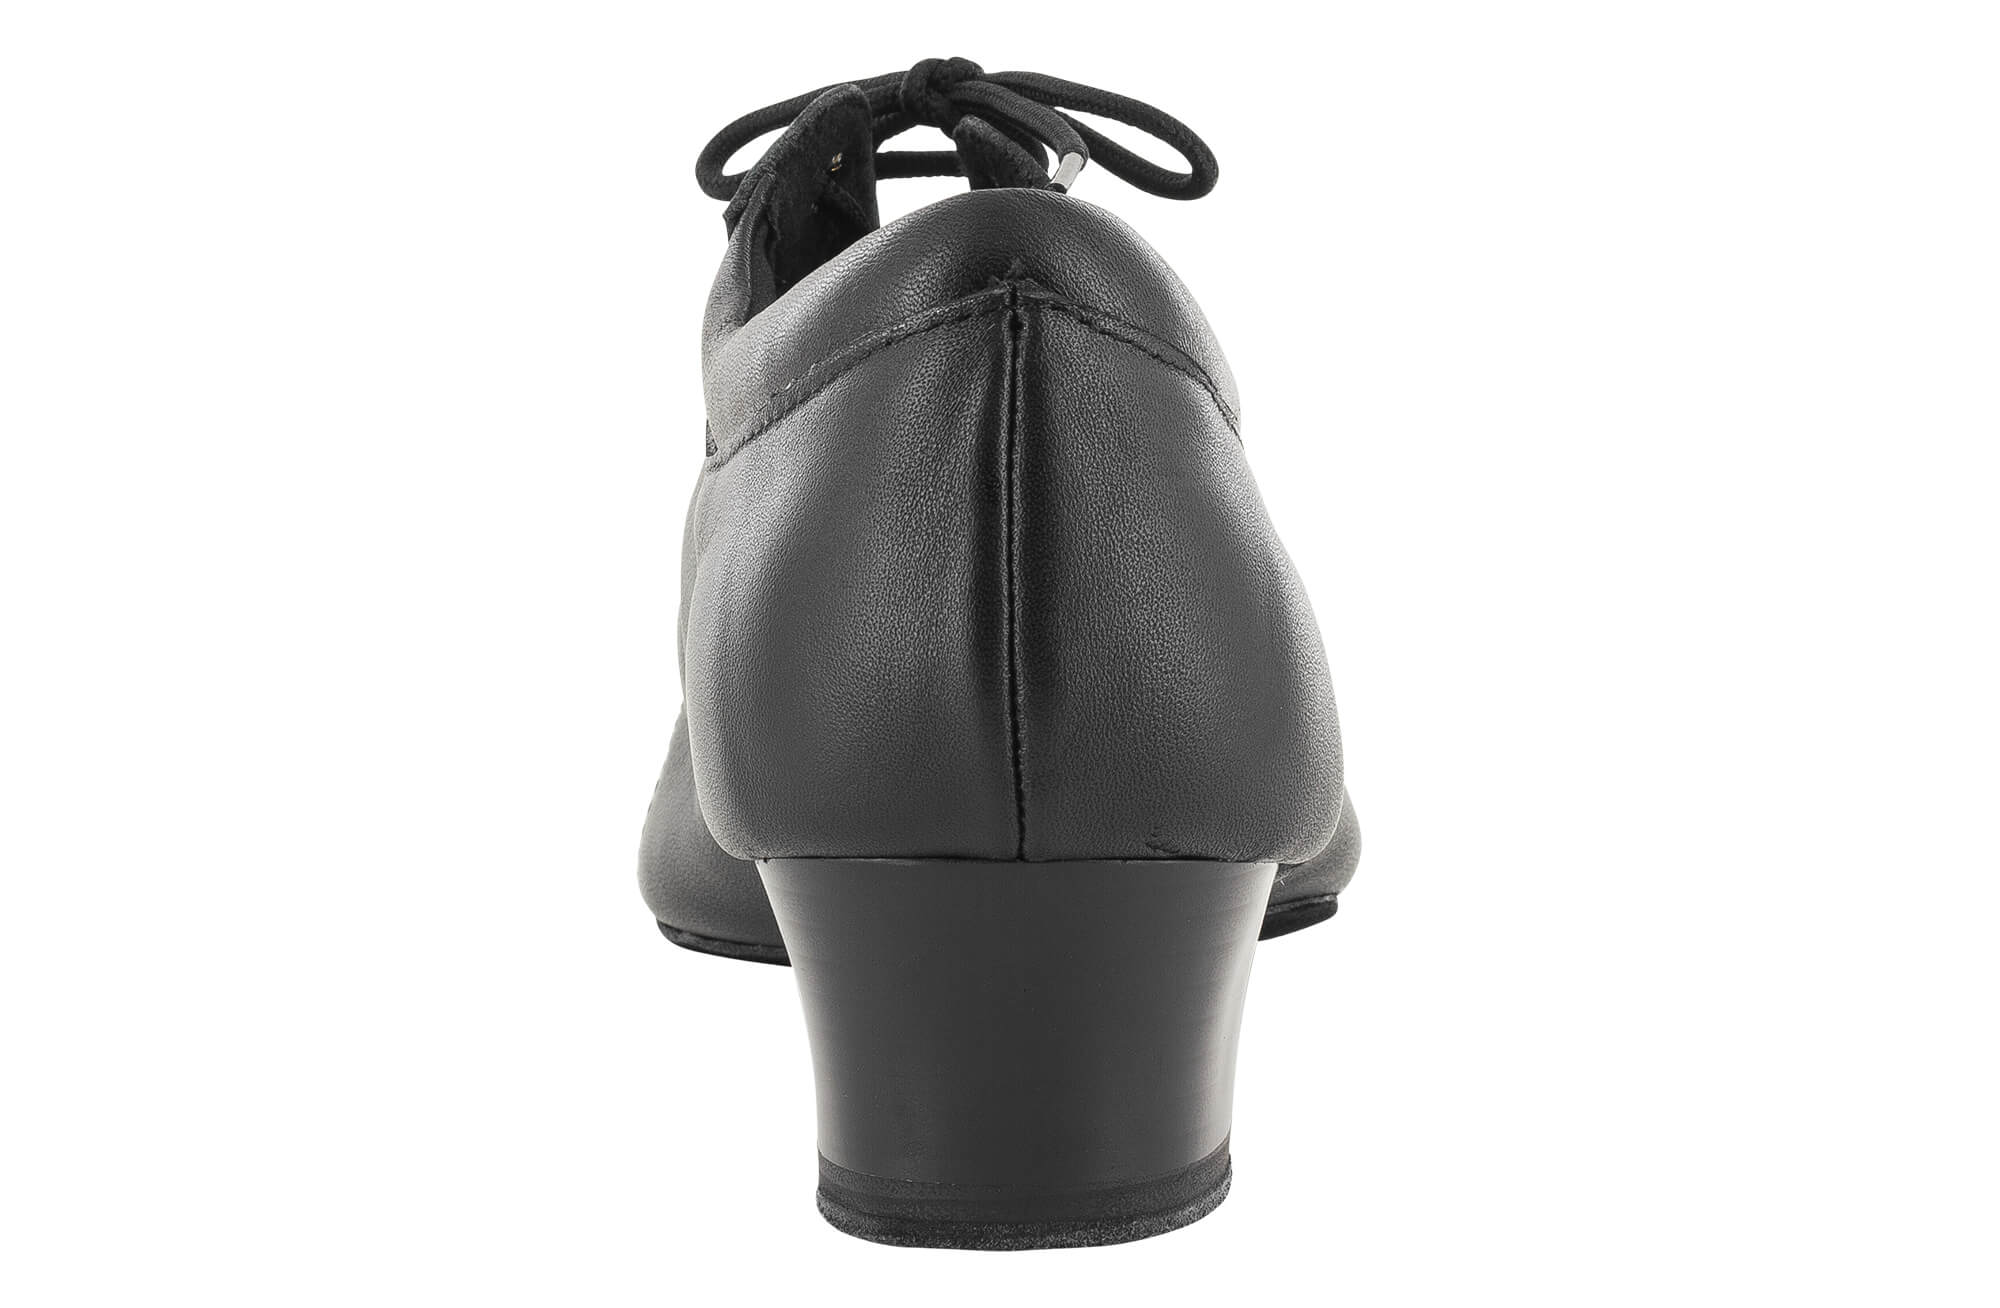 Professional dancing shoes half sole black heel 4 cm Dancin scarpe da ballo